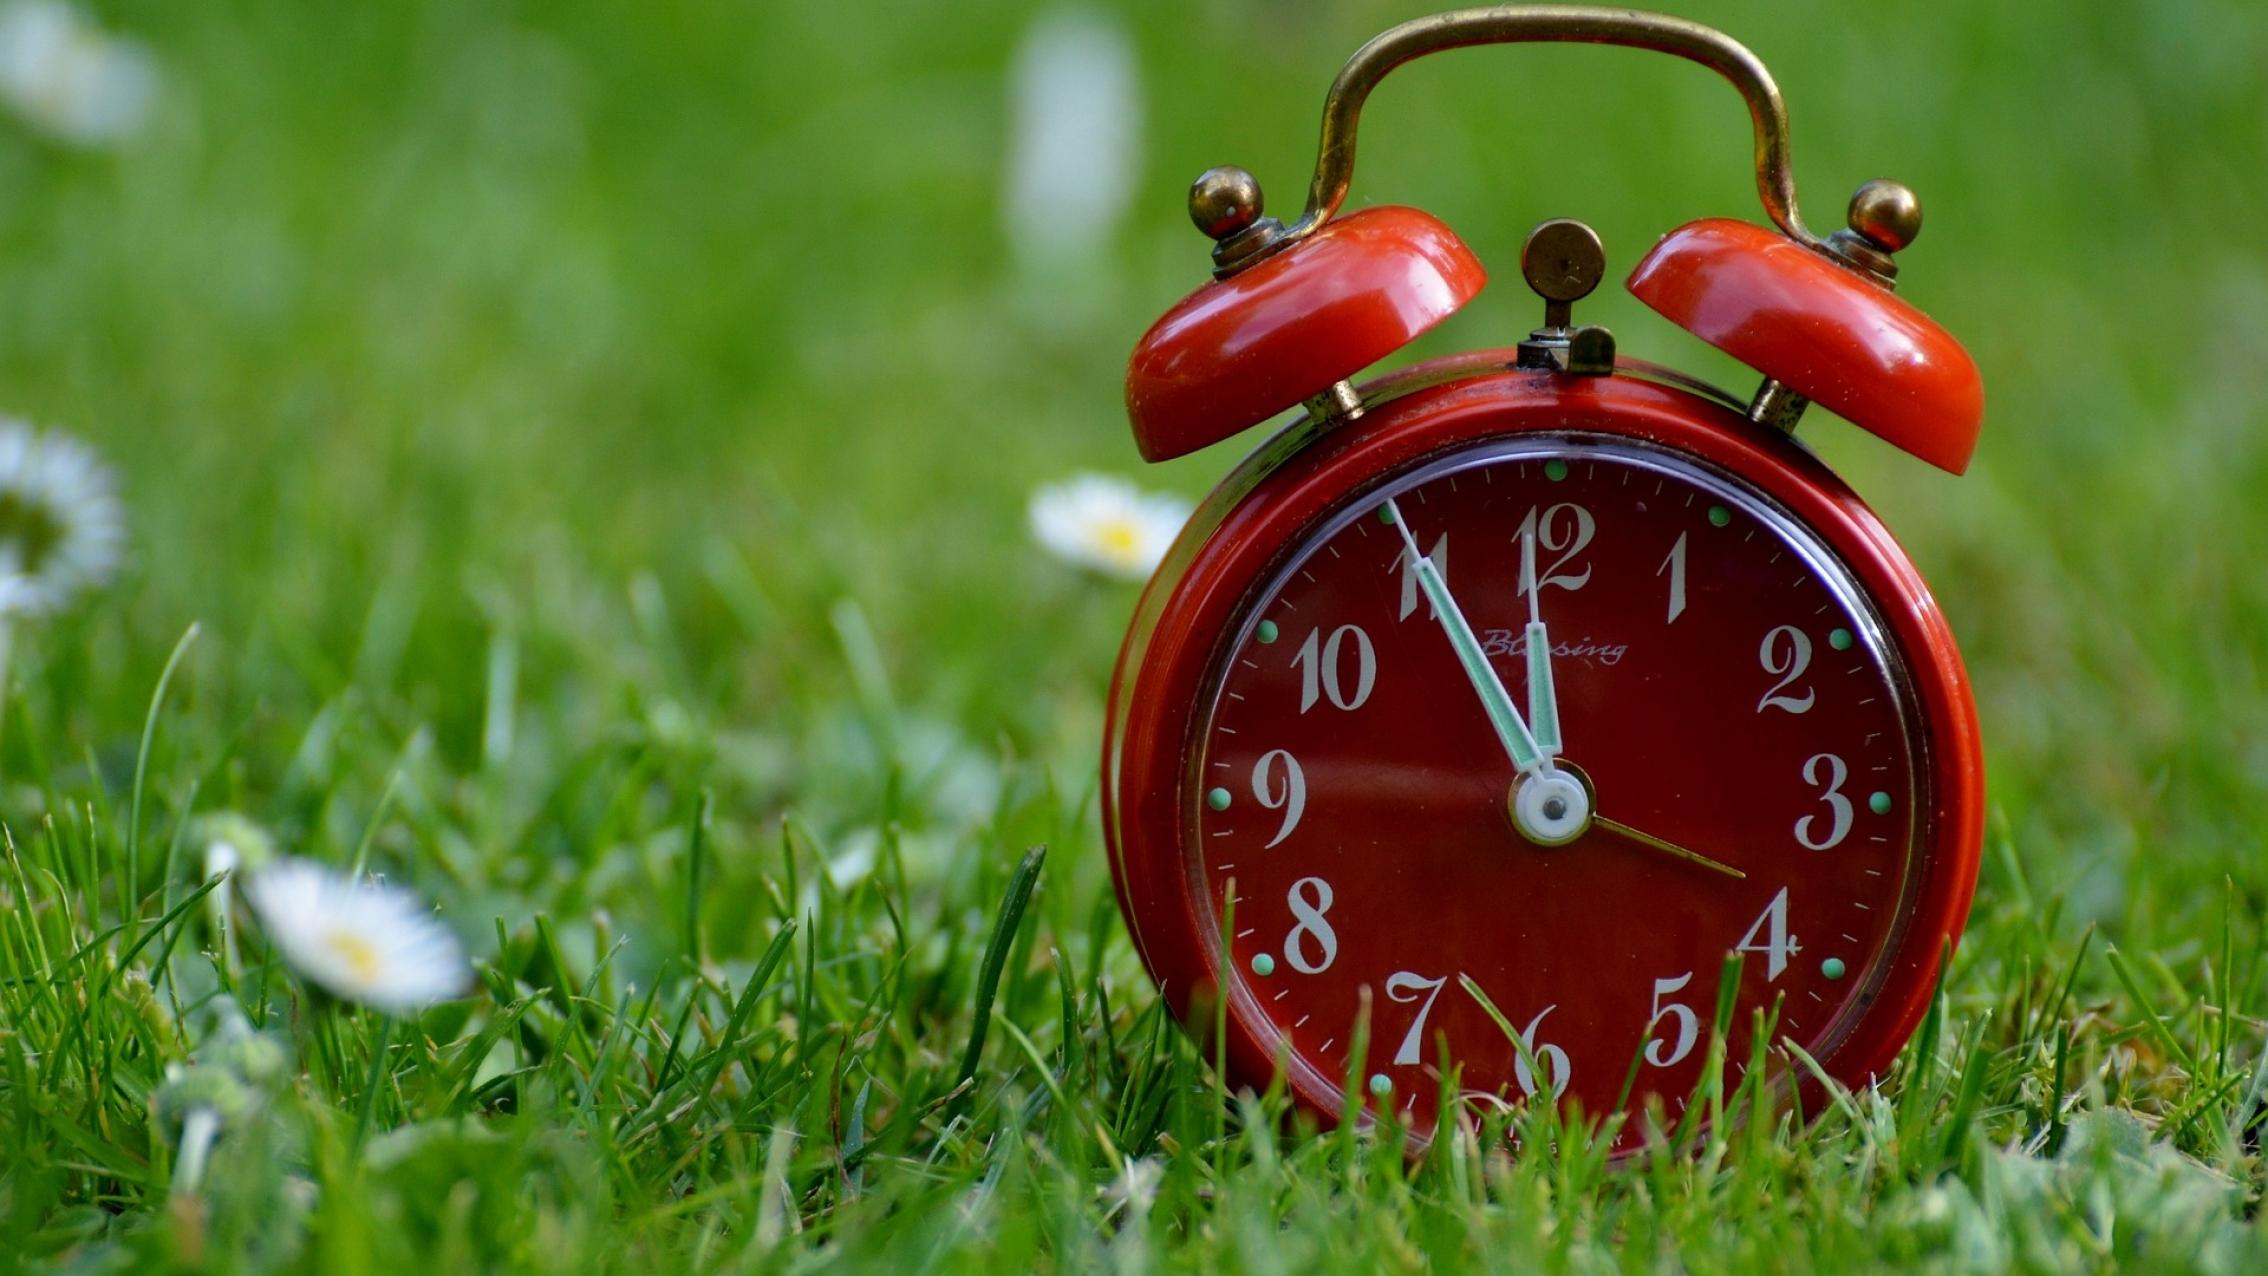 Clock on Lawn Grass